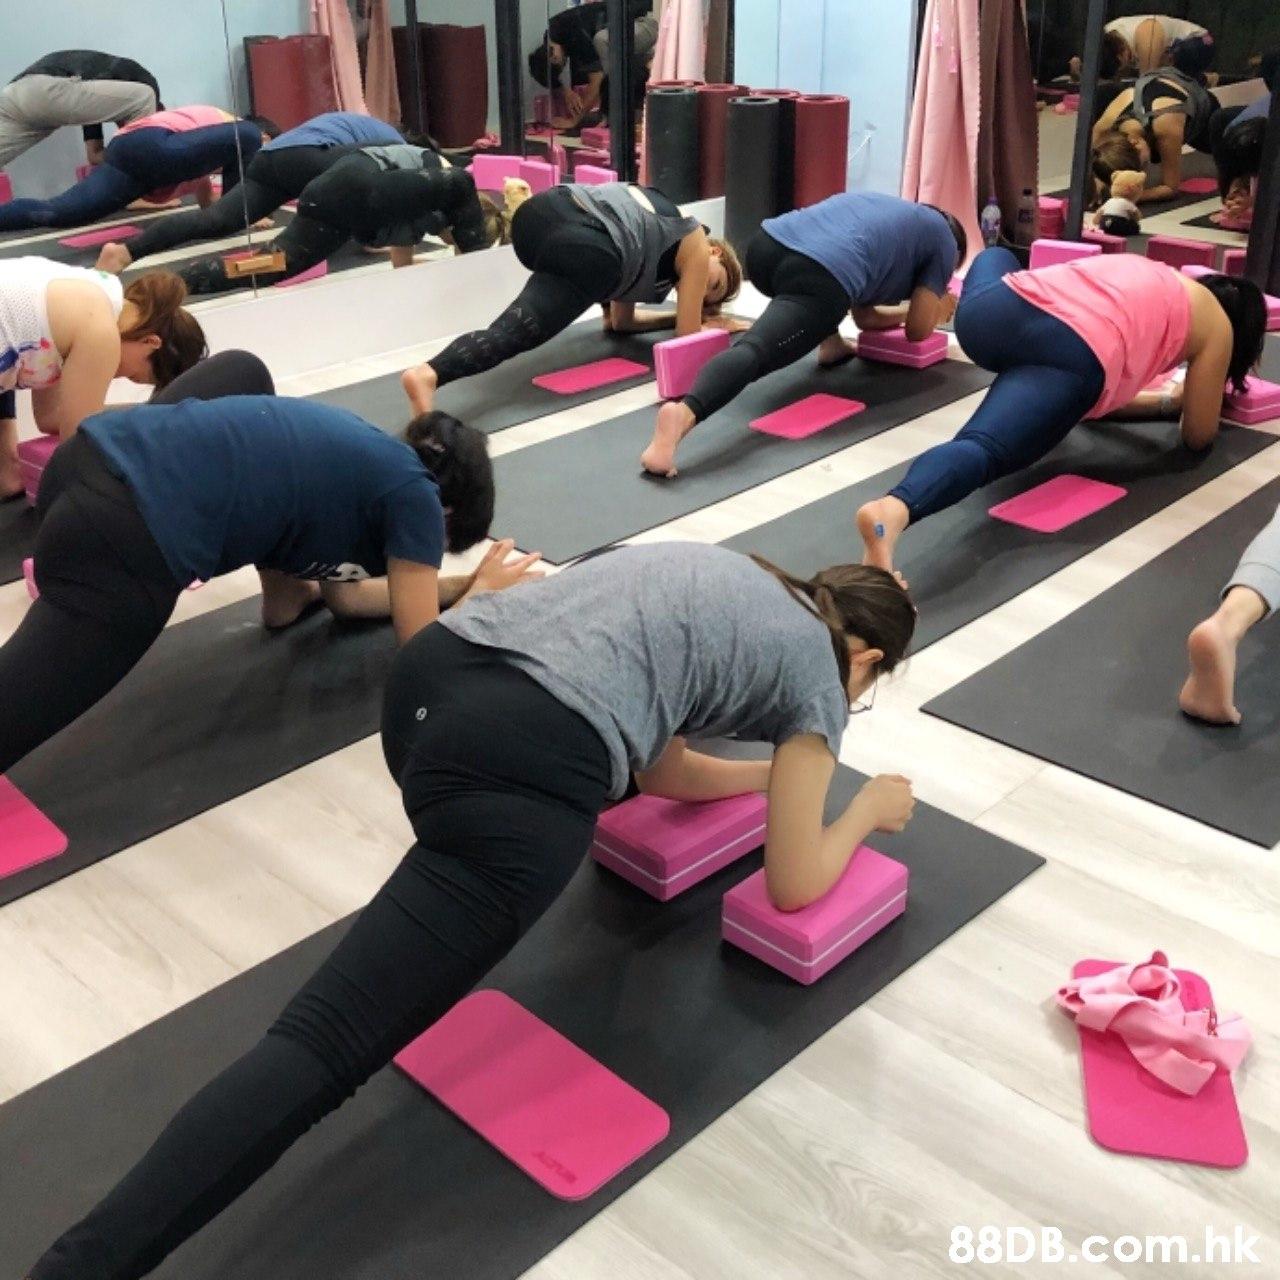 .hk A  Physical fitness,Yoga,Pilates,Yoga mat,Strength training